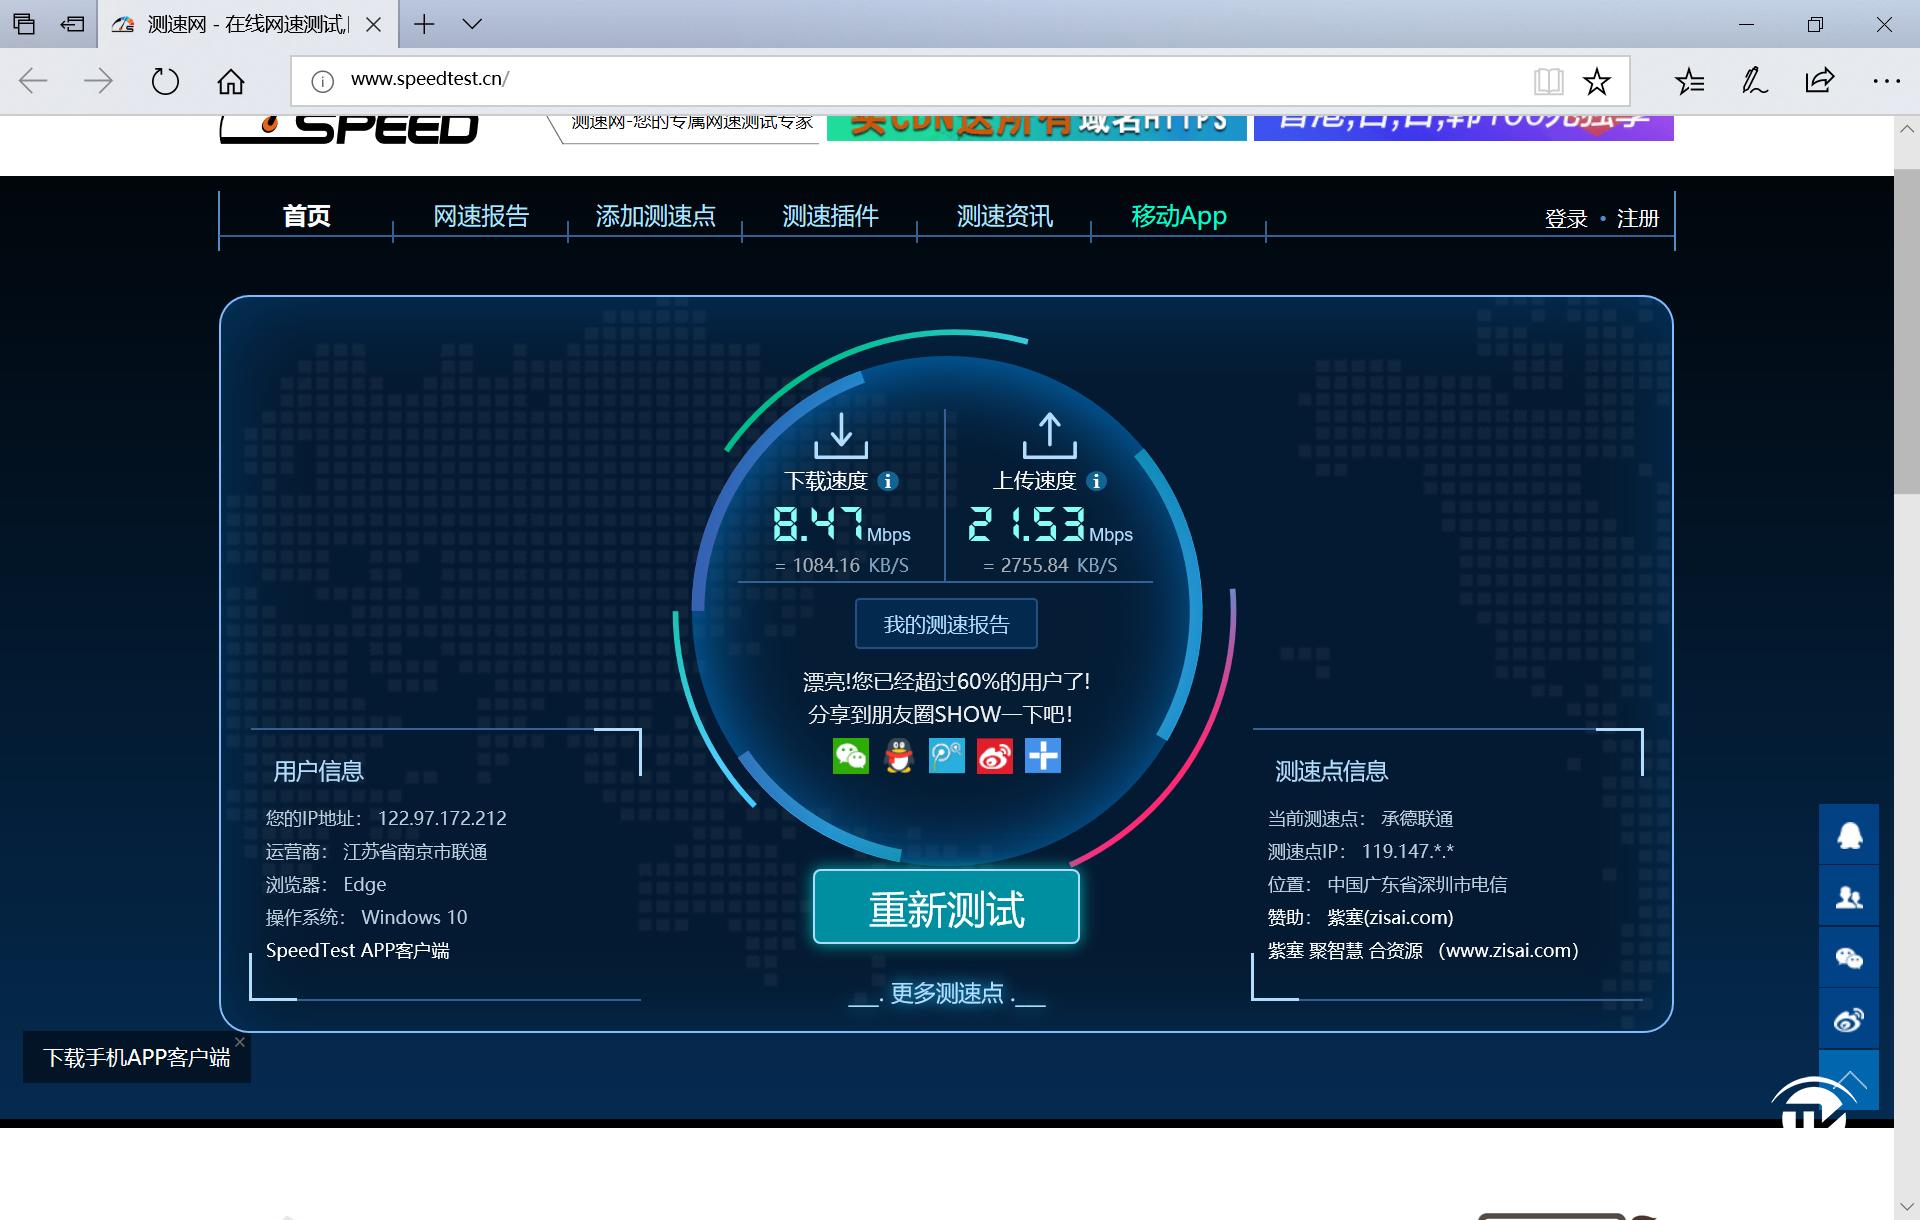 netspeed.png